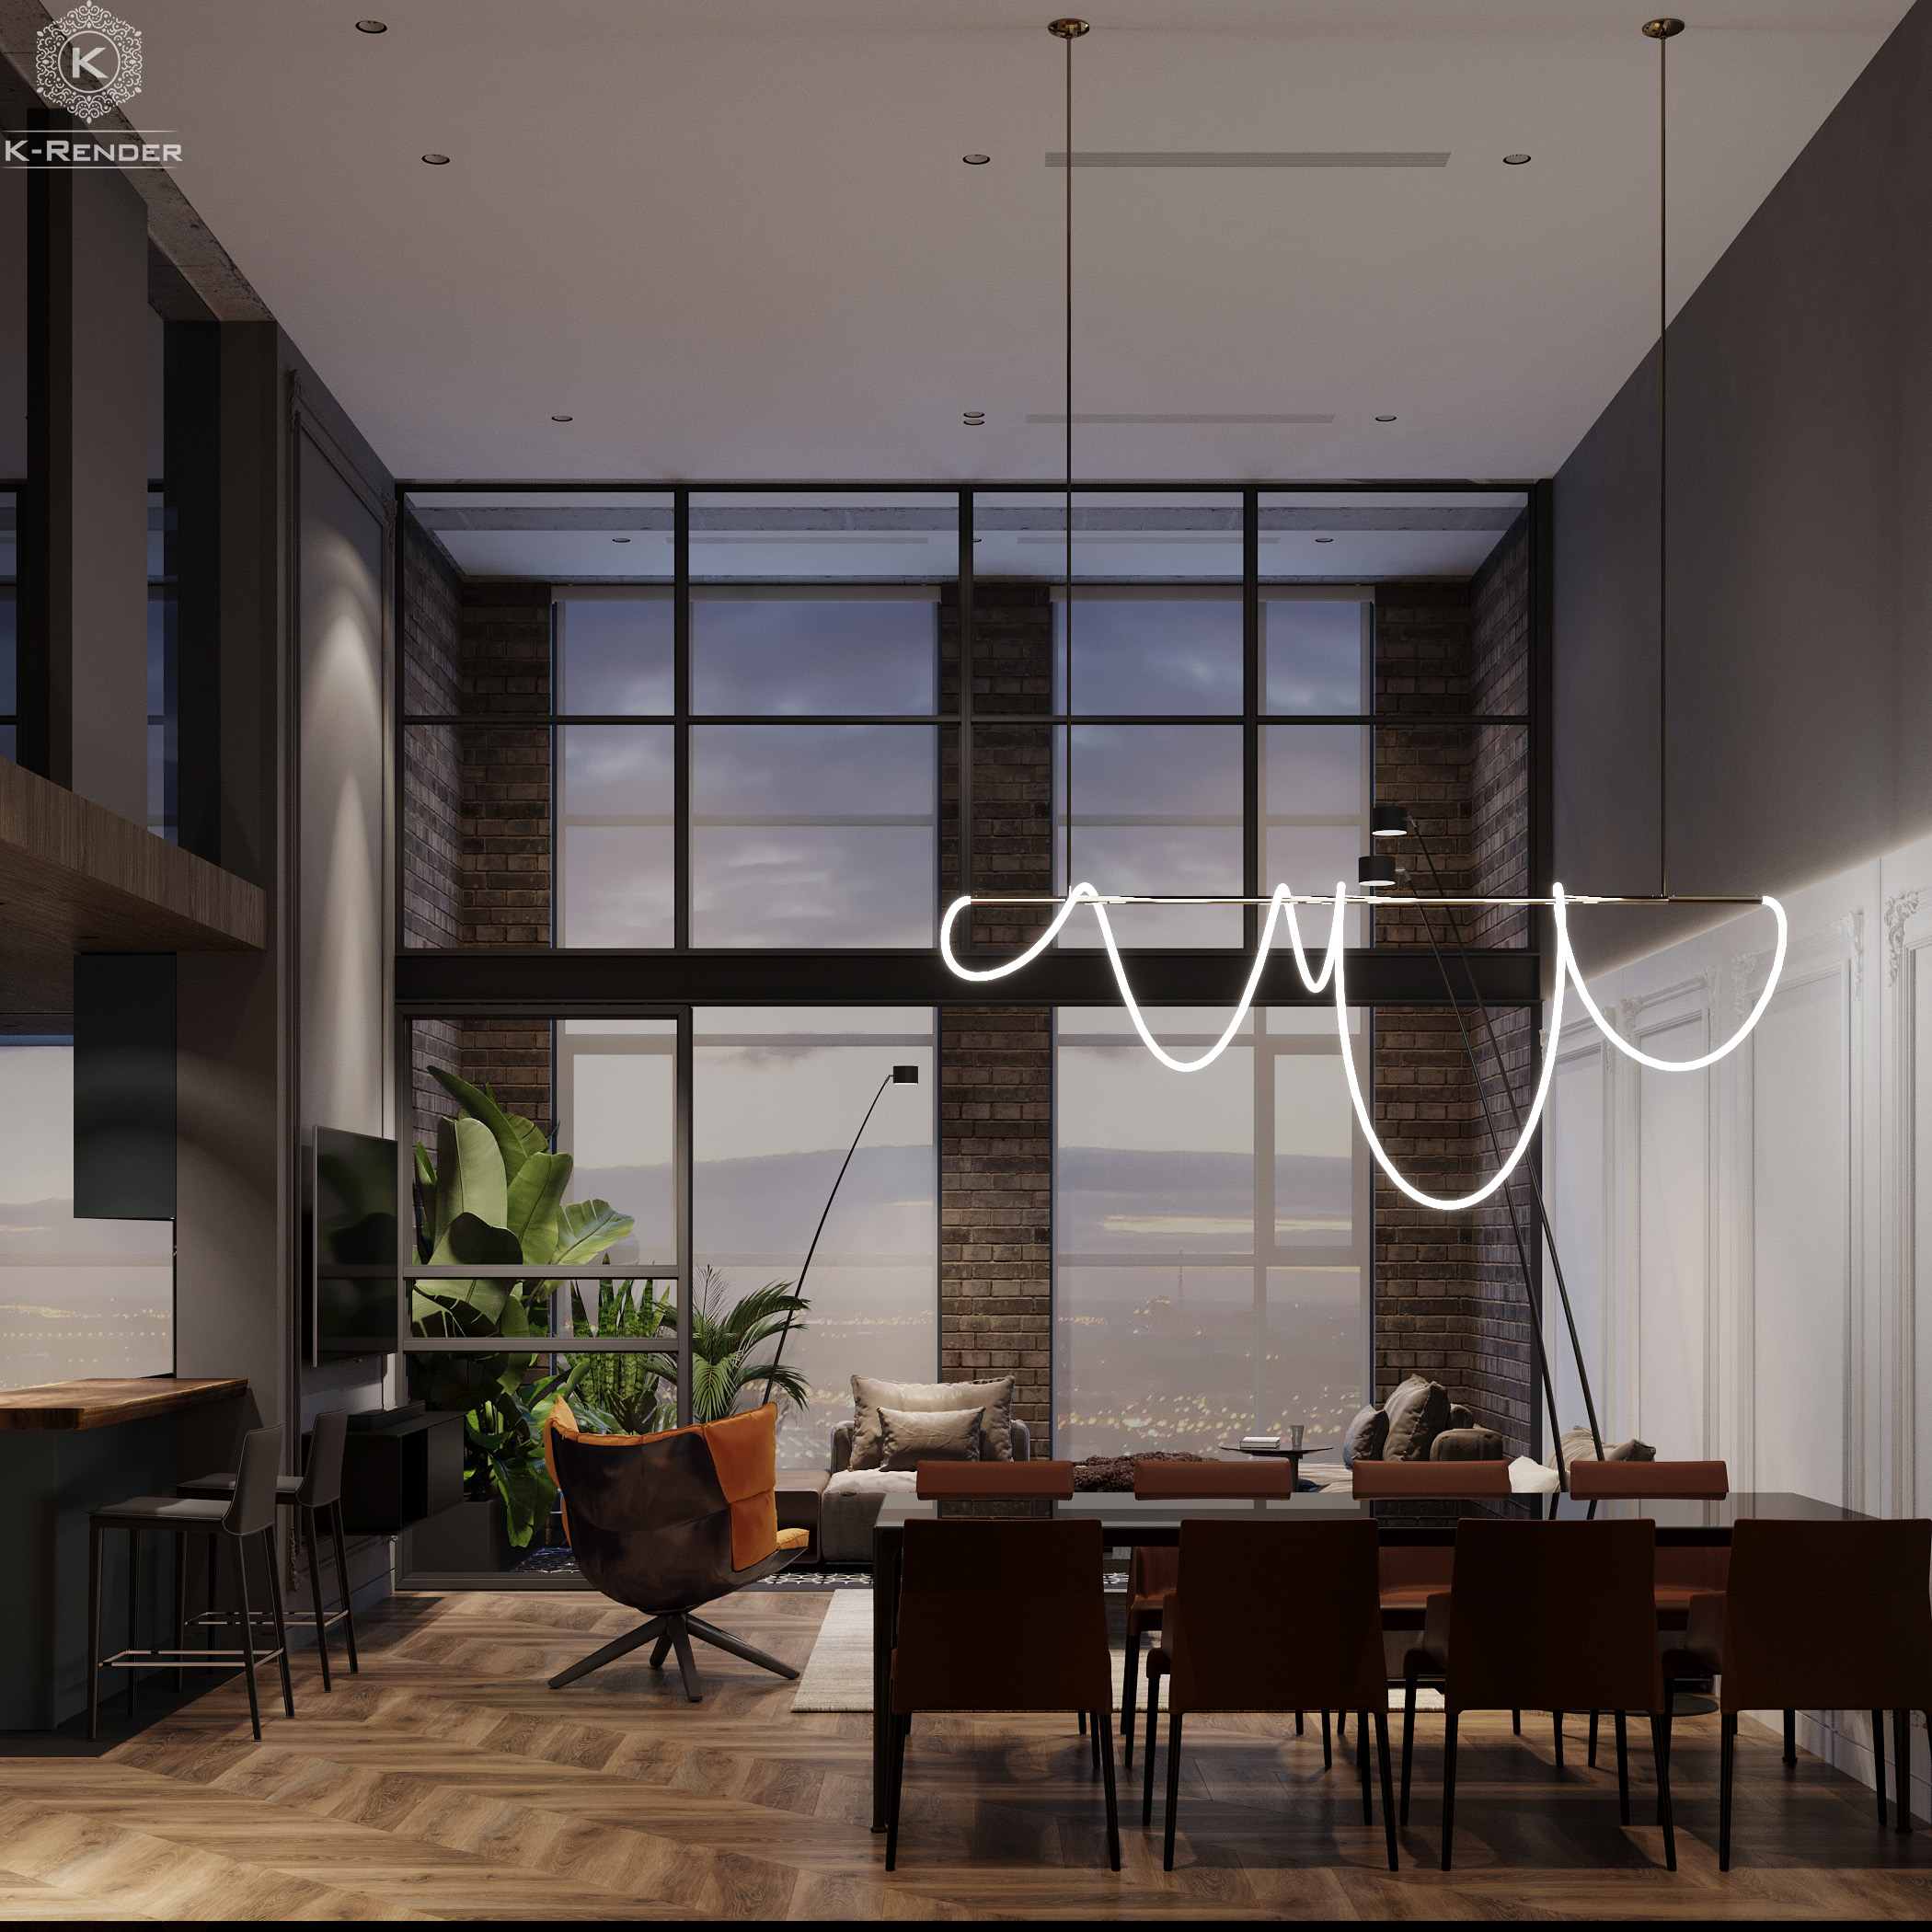 sunshine-apartment-k-render-studio-3d-rendering-studio-4